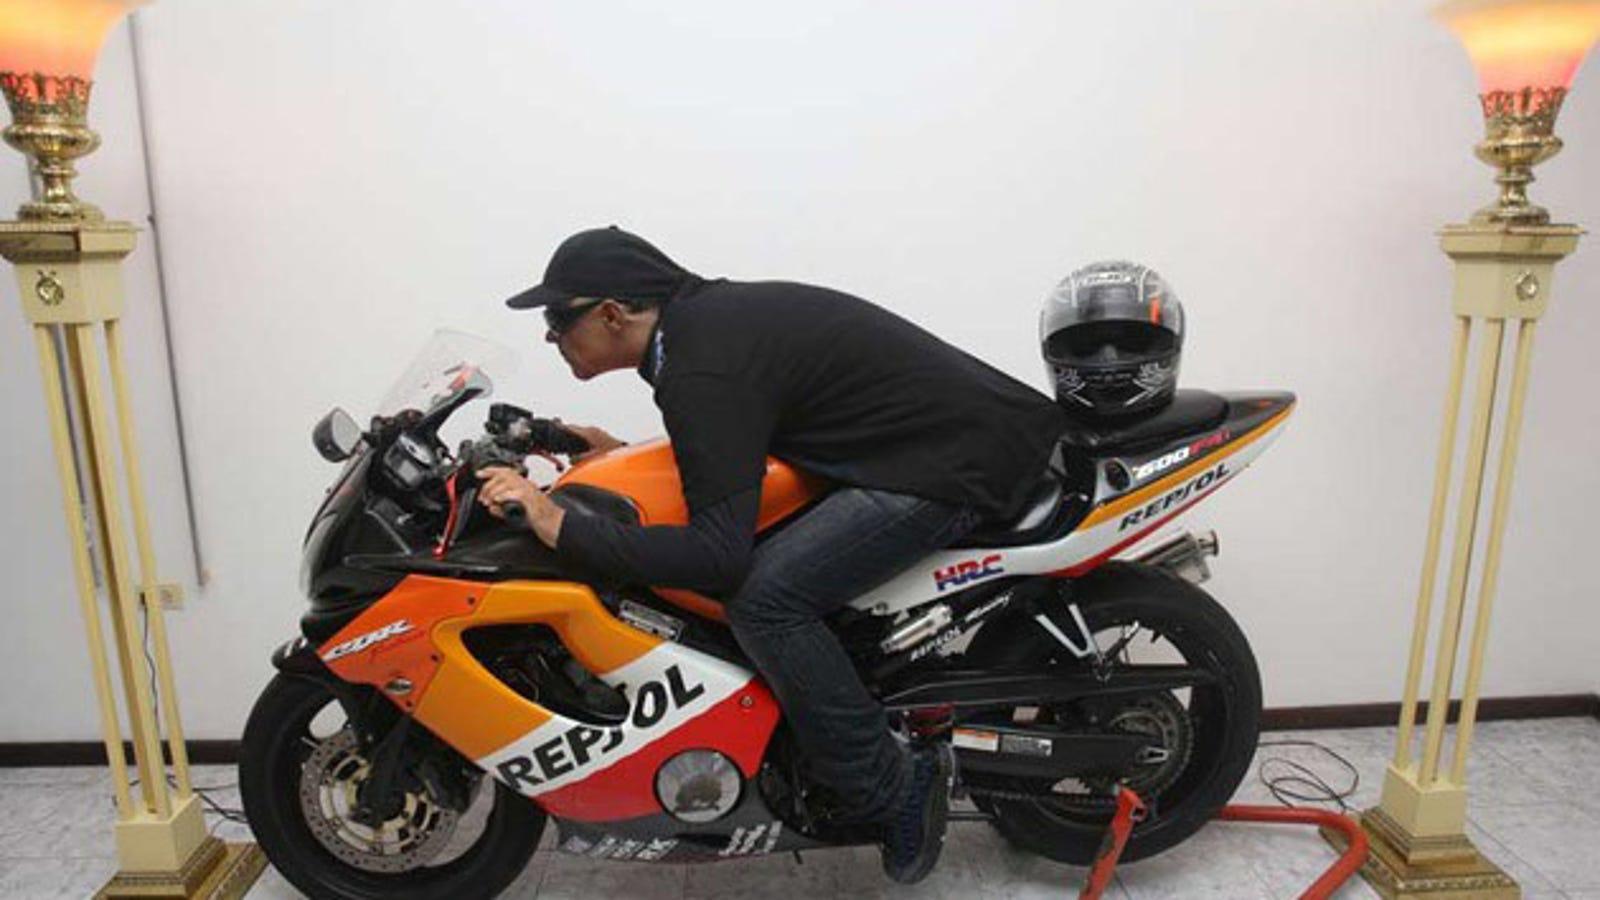 motorcycle shooting k  Funeral Home Displays Shooting Victim On Motorcycle For Wake